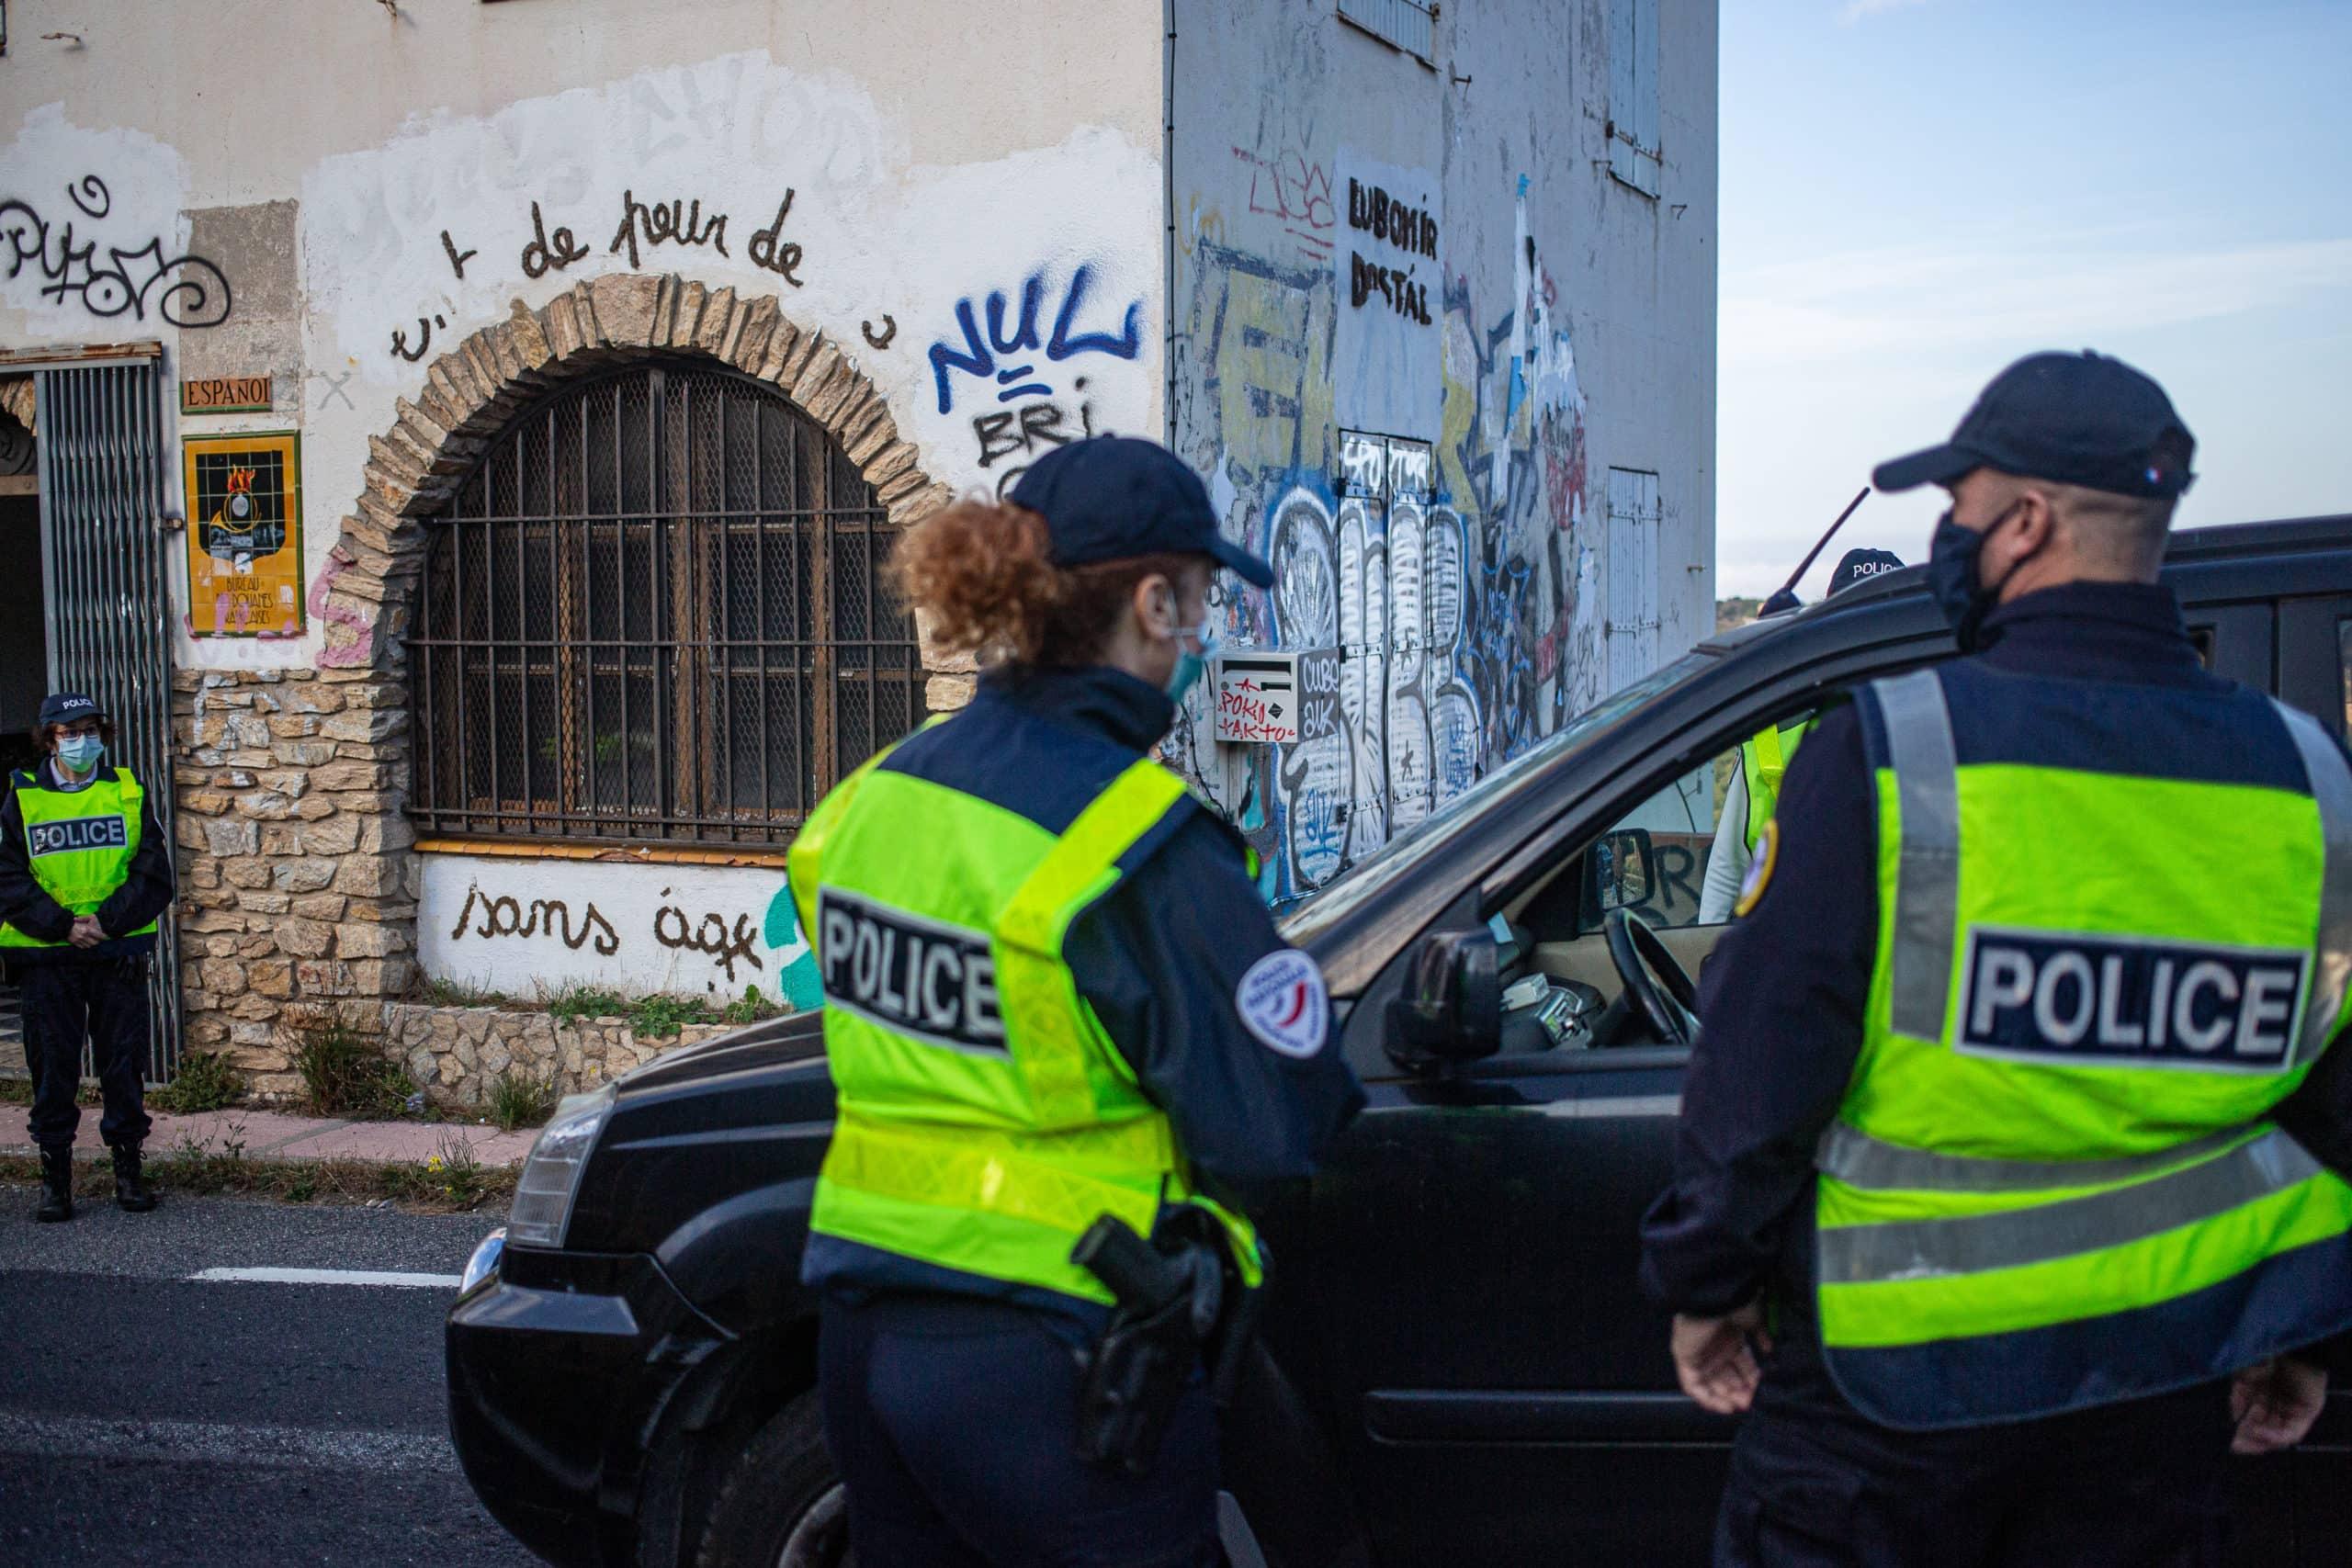 FRANCE - SECURITY - BORDER - POLICE - CONTROL - MIGRATION